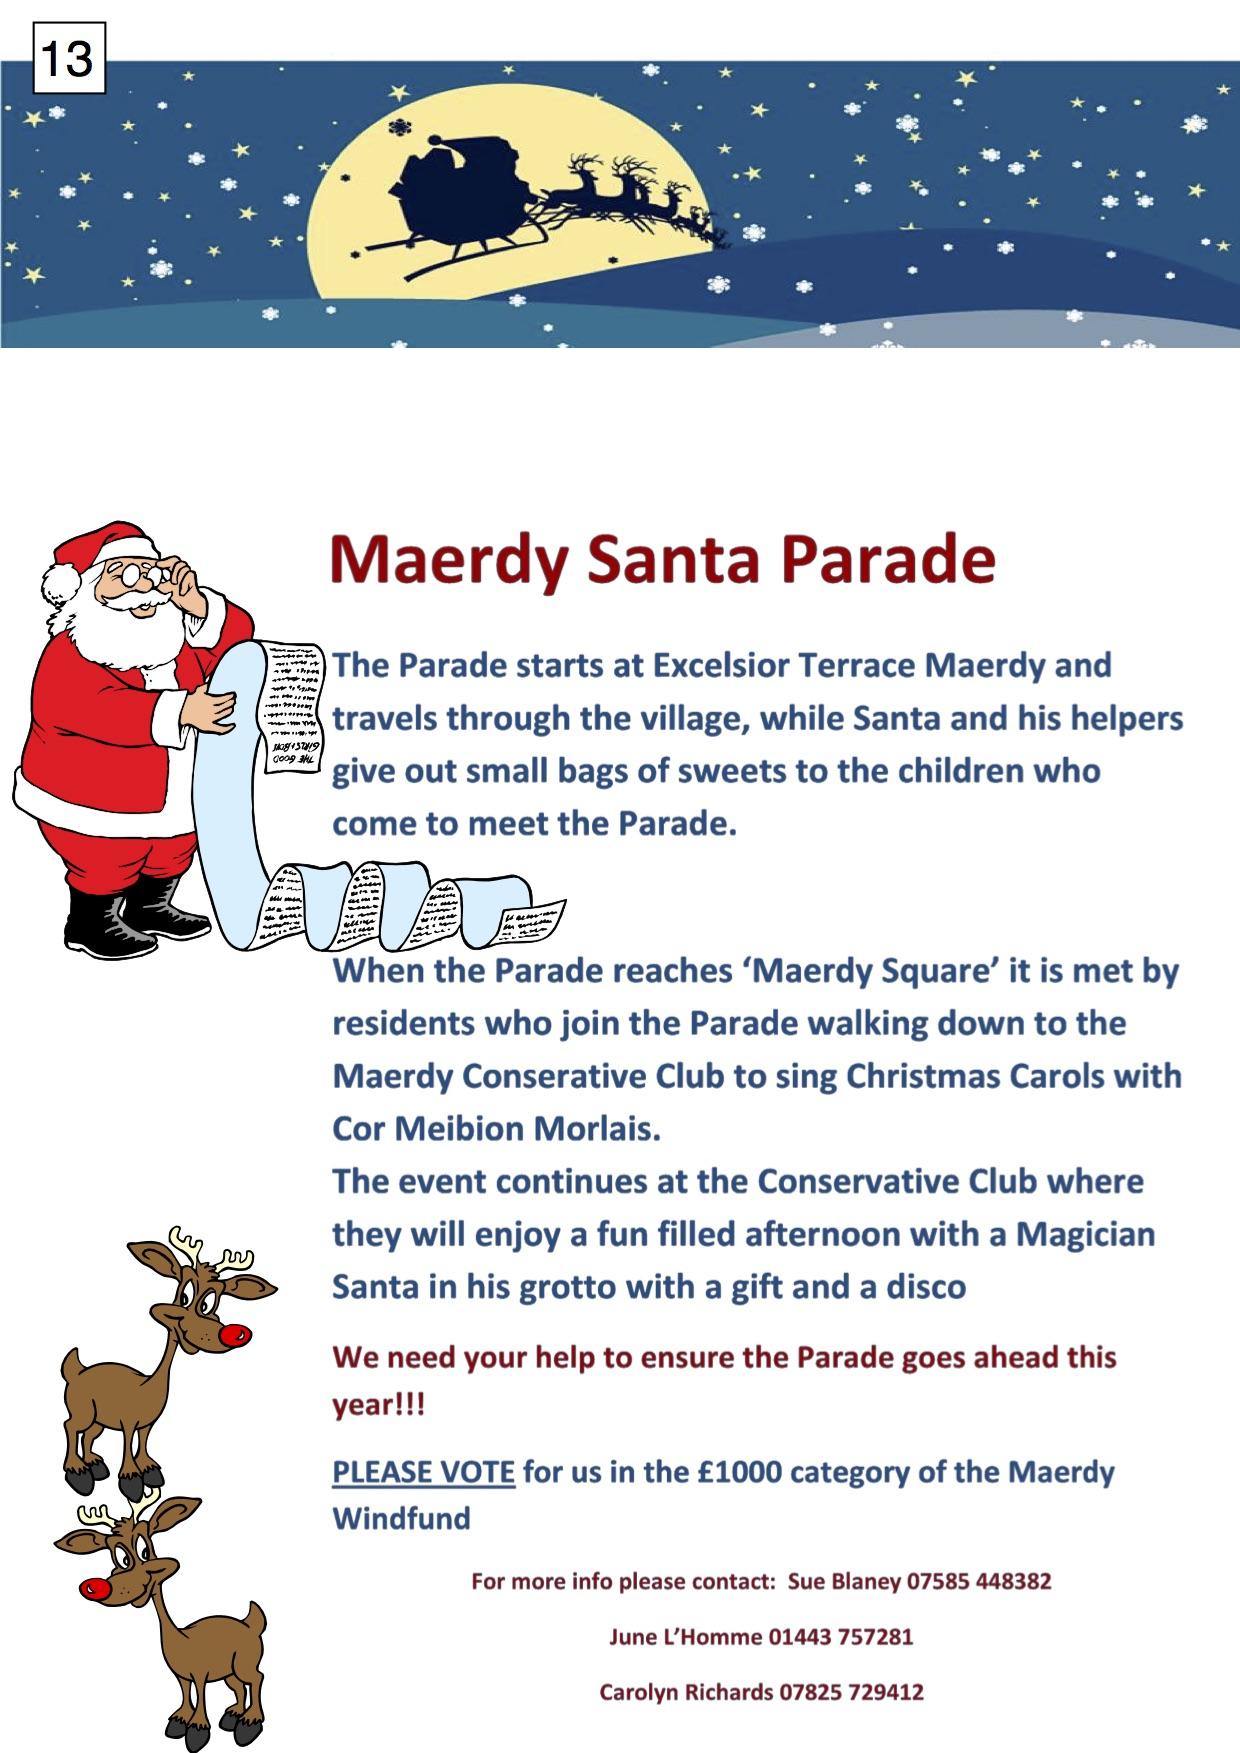 13. Maerdy Santa Parade - poster - 291017